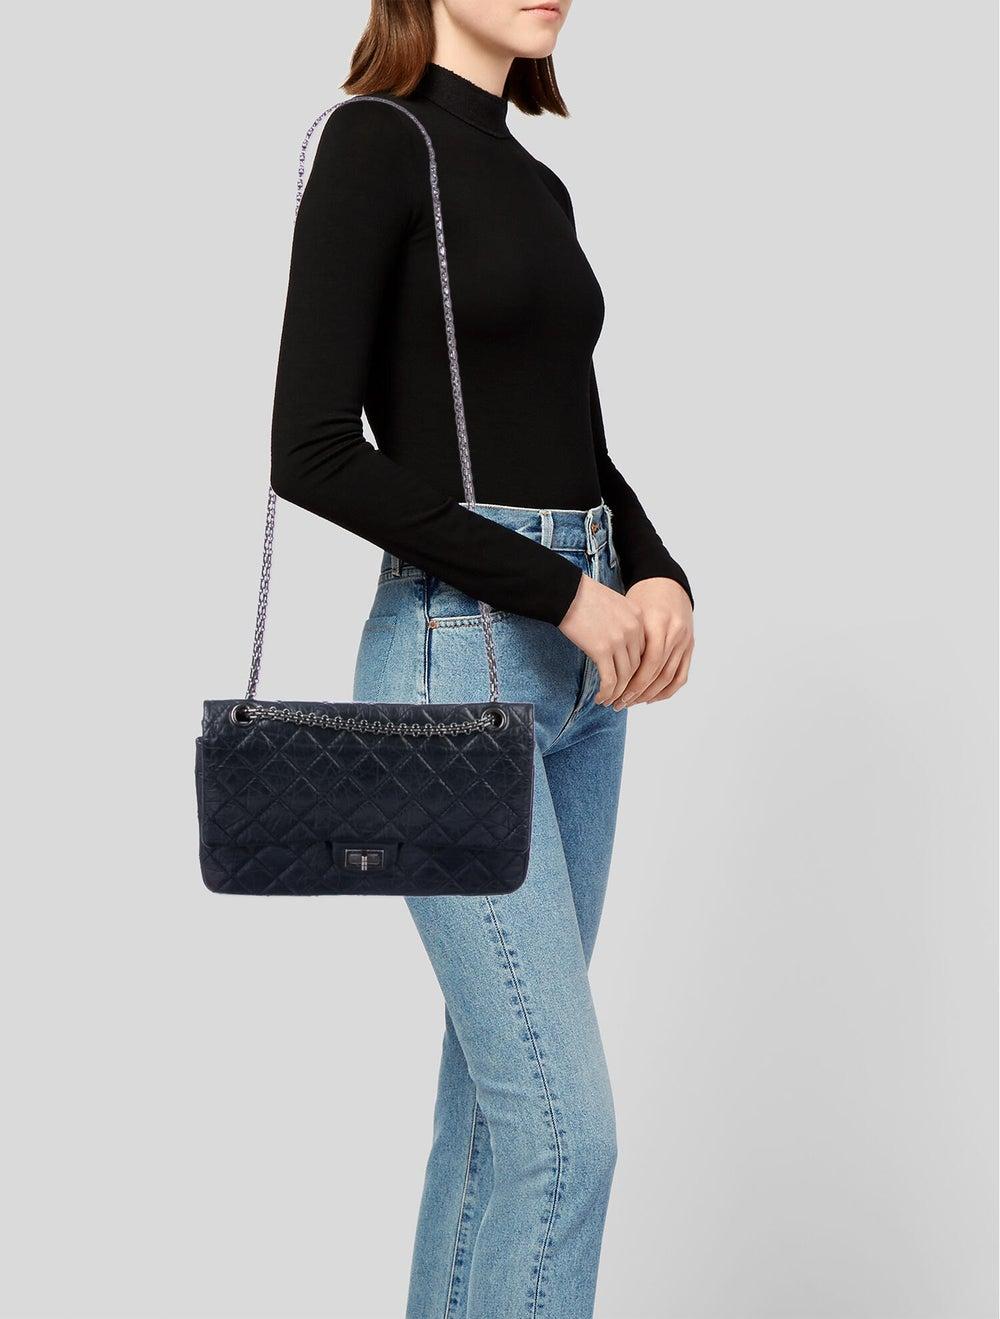 Chanel Reissue 226 Double Flap Bag Blue - image 2